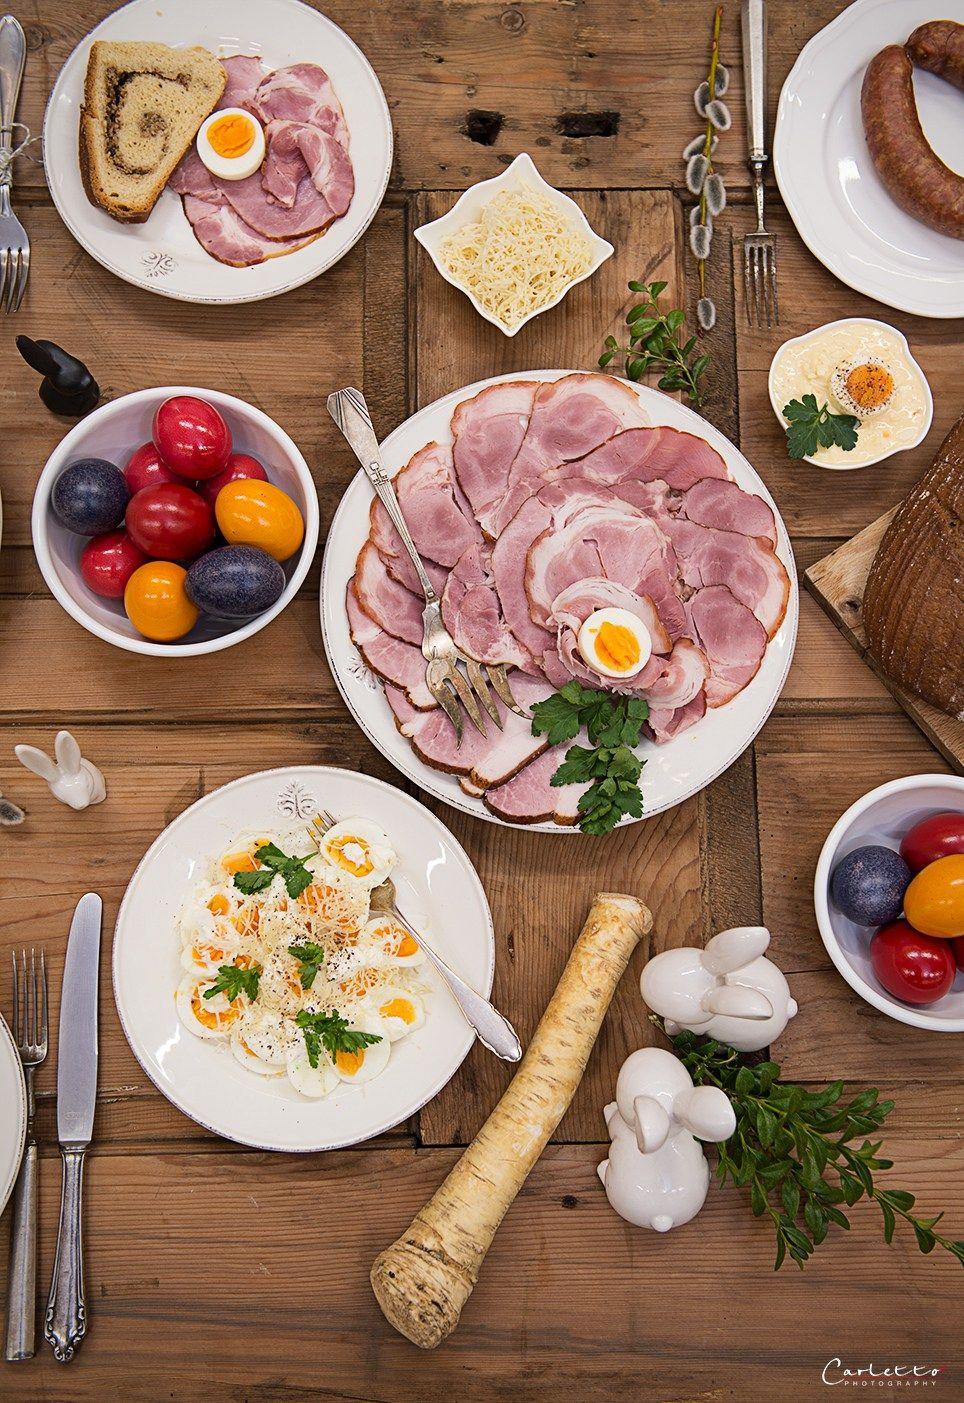 MAGAZIN: Ostern in Kärnten - Traditionell Ostern feiern in Kärnten ...